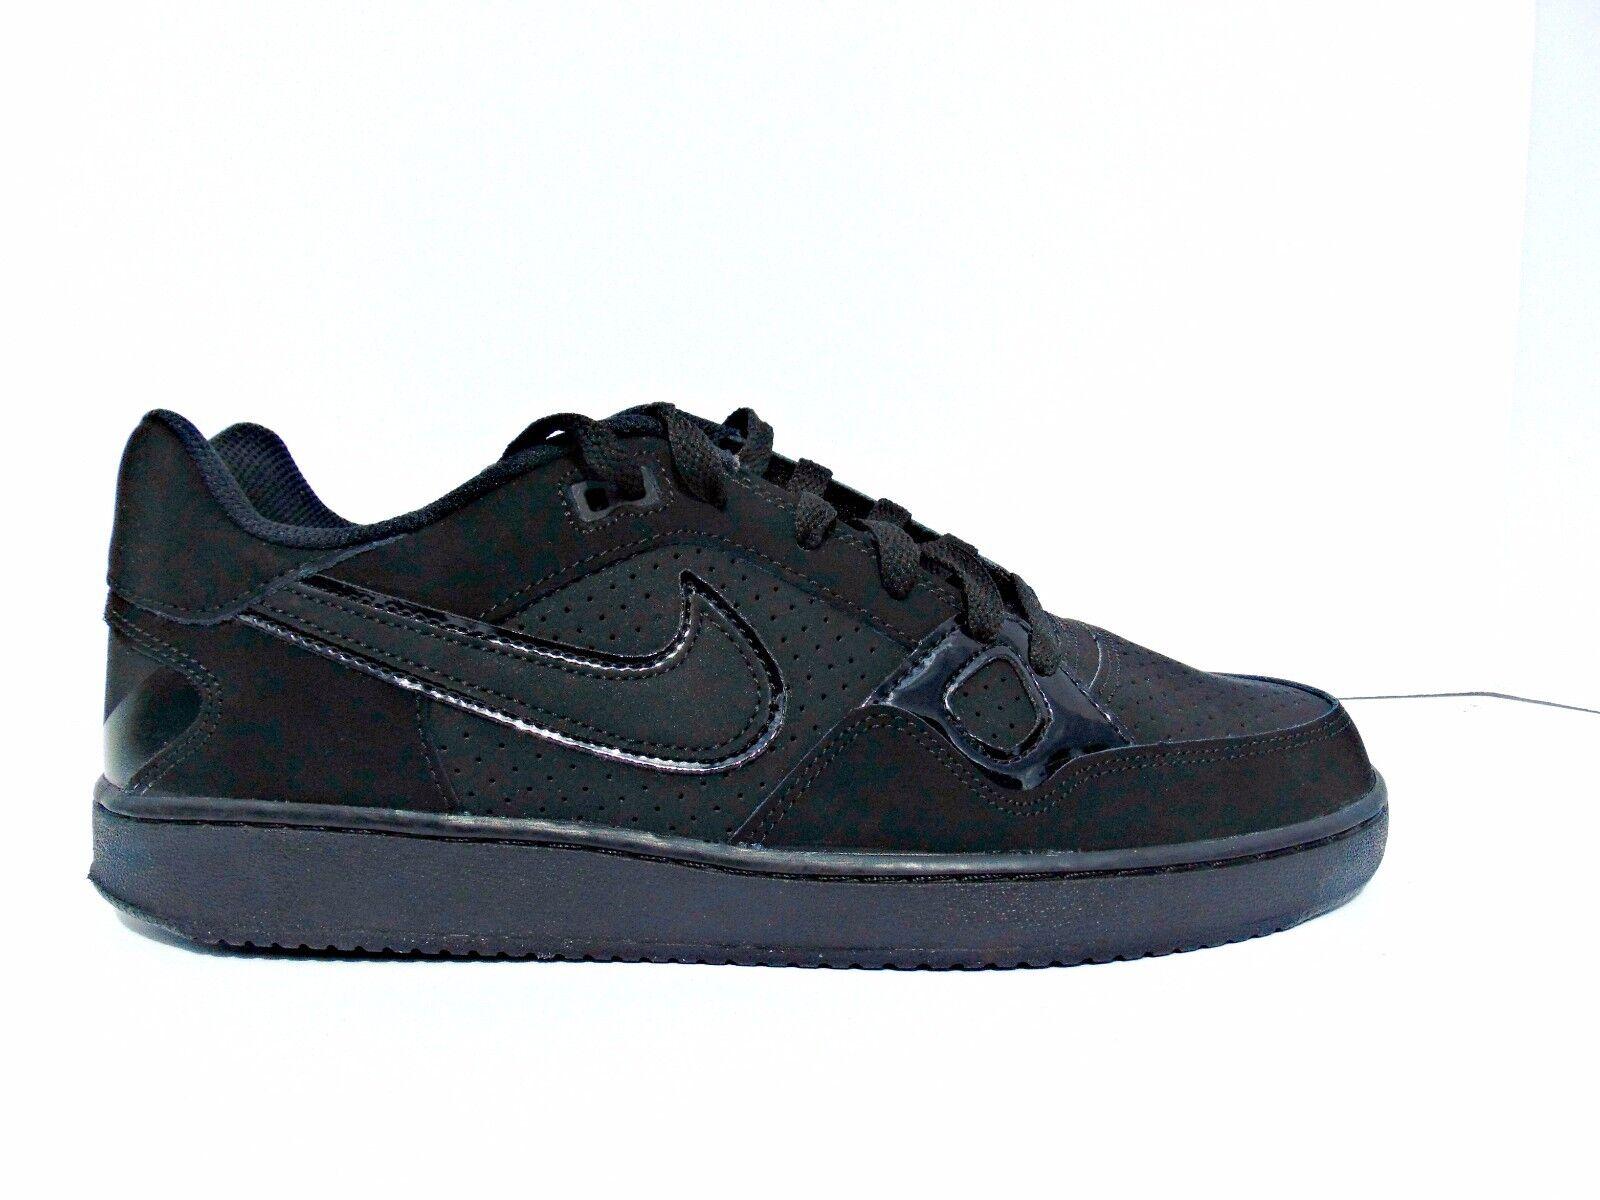 4b19d7bd22db Nike Nike Nike Son Of Force Low-Top Black Mens US Size 10 40008c ...